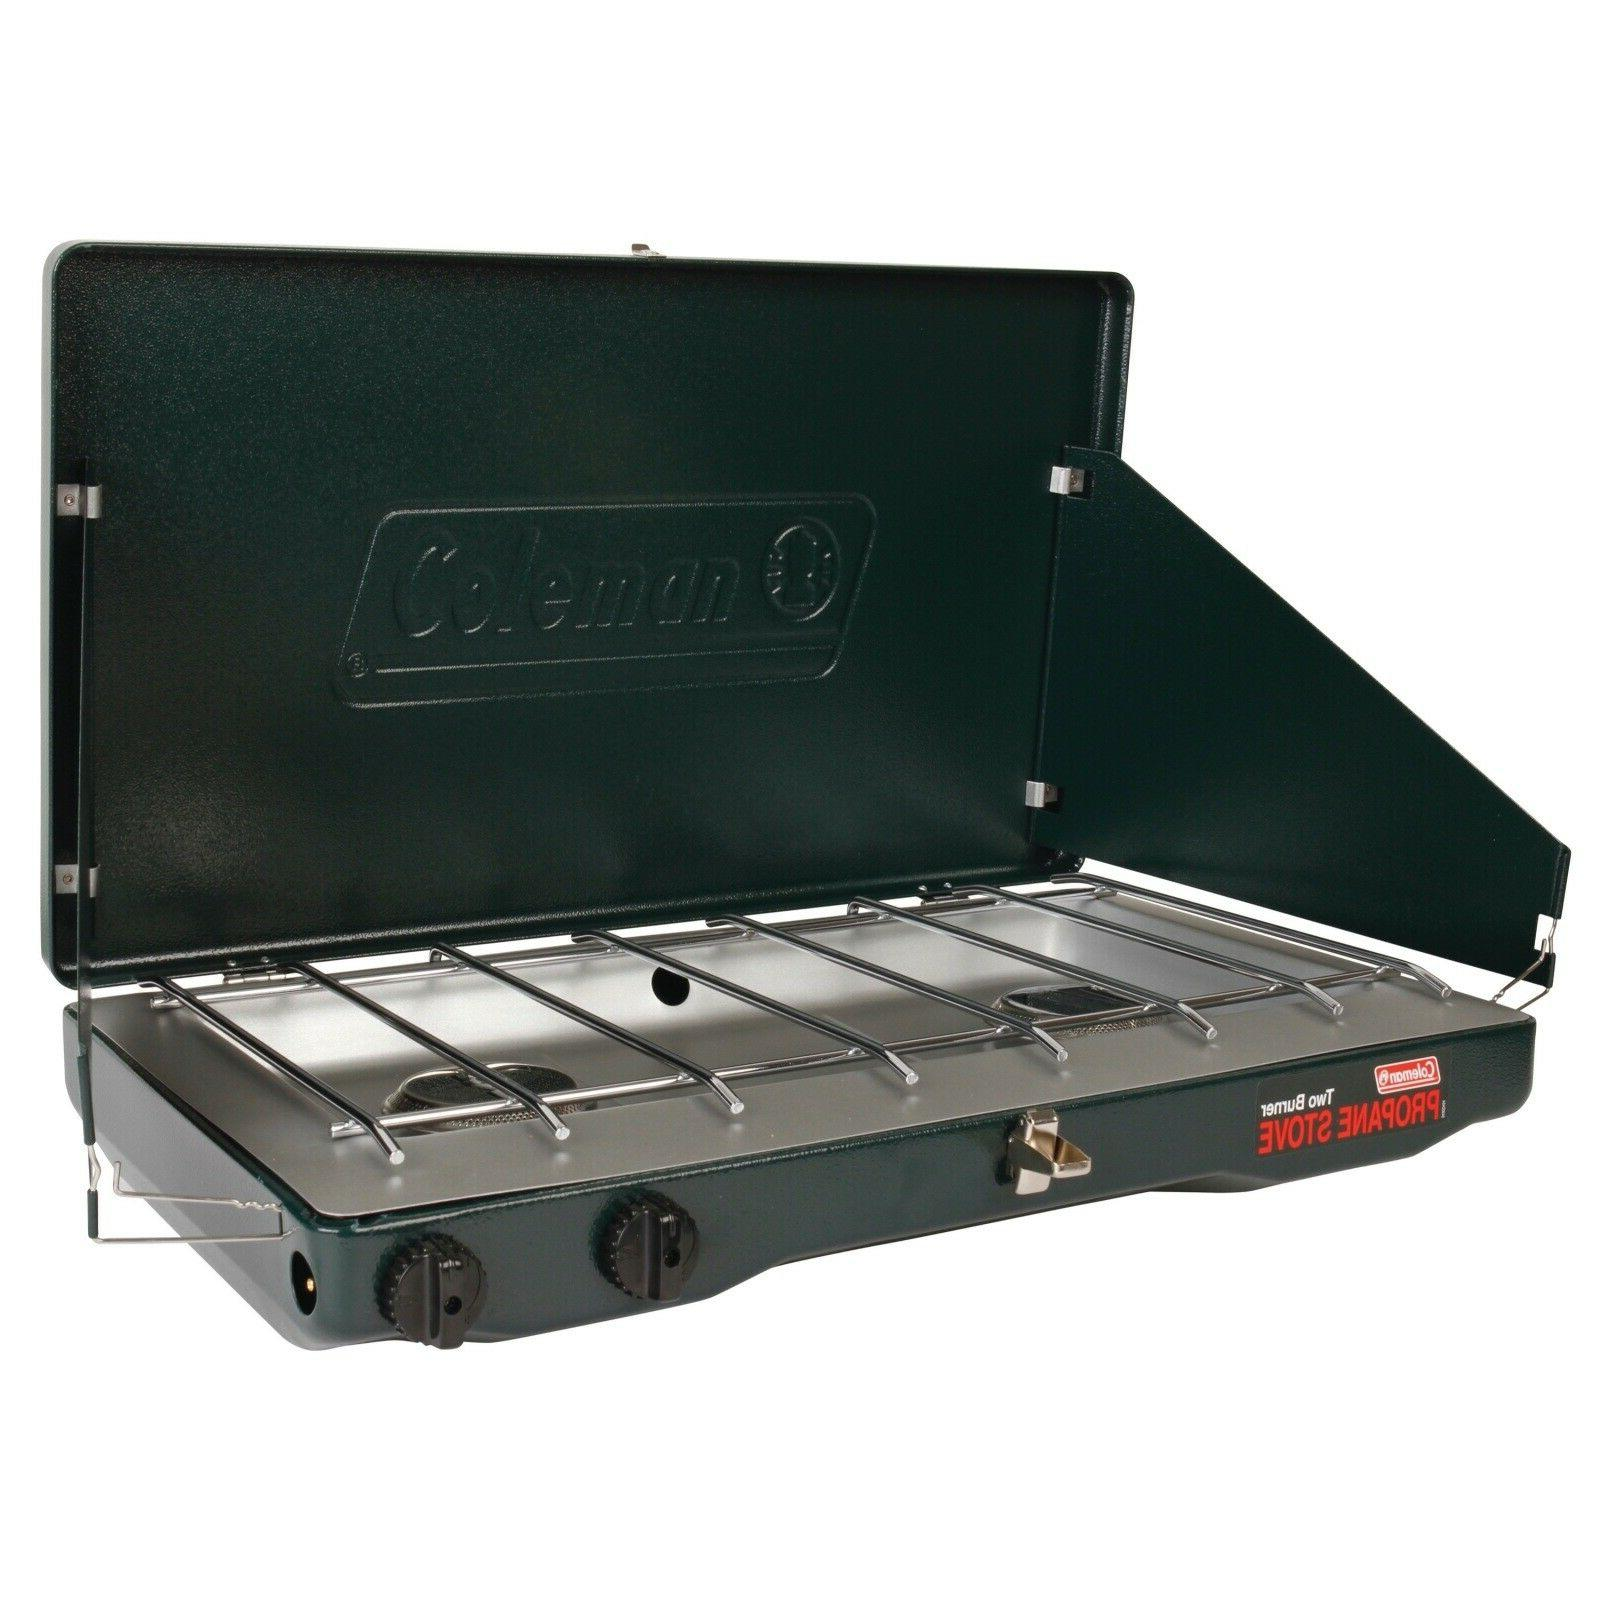 CAMP STOVE 2 Burner Portable NEW